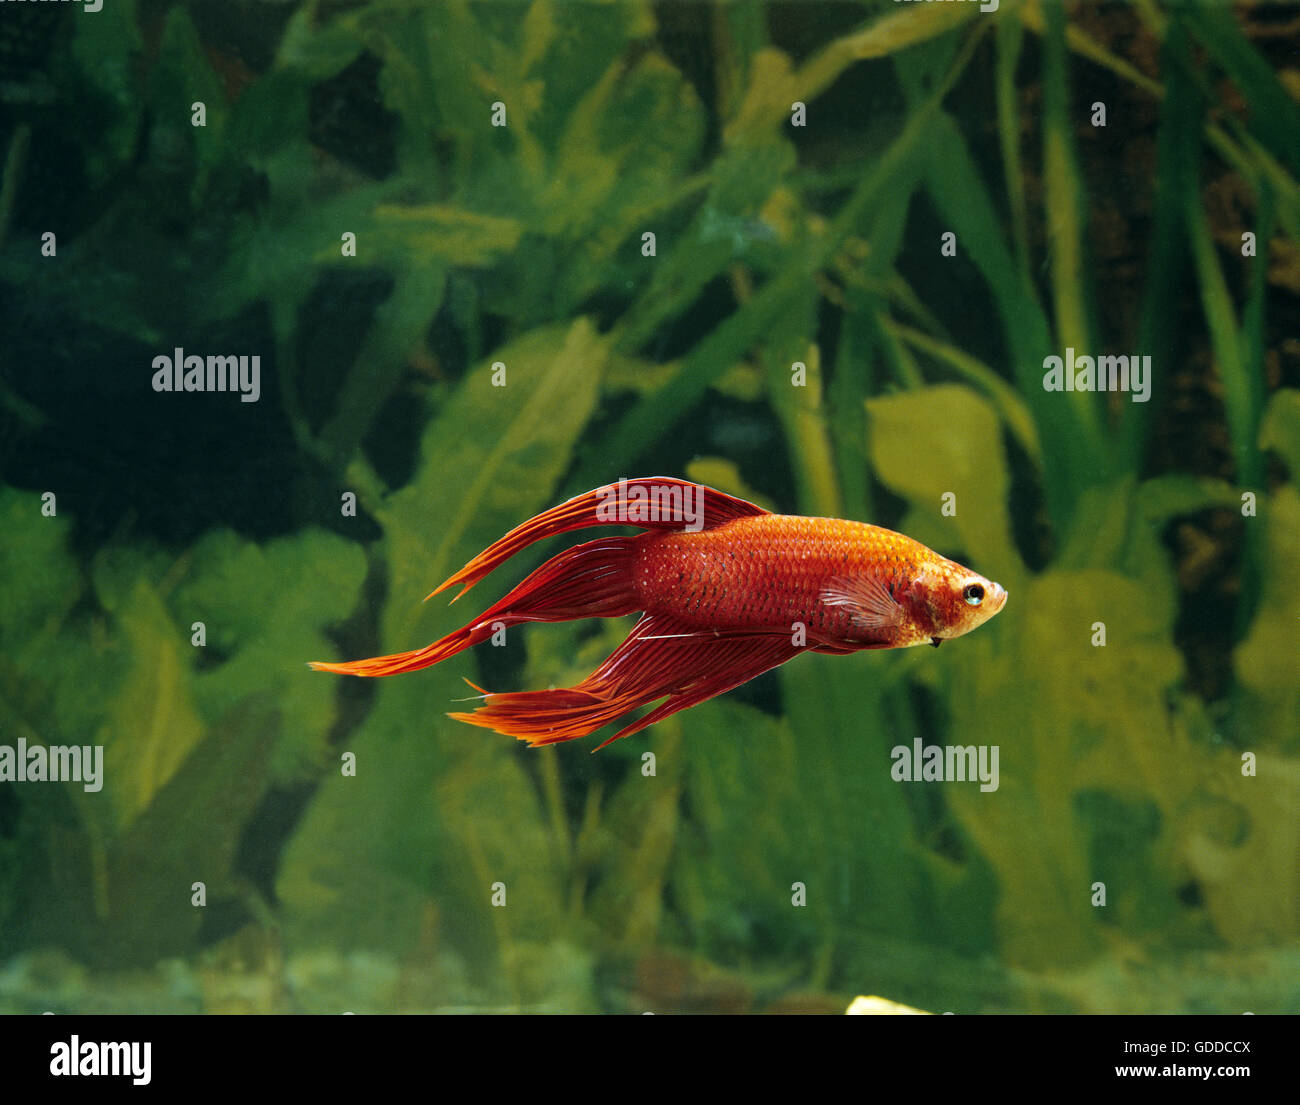 Fighting Fish, betta splendens - Stock Image